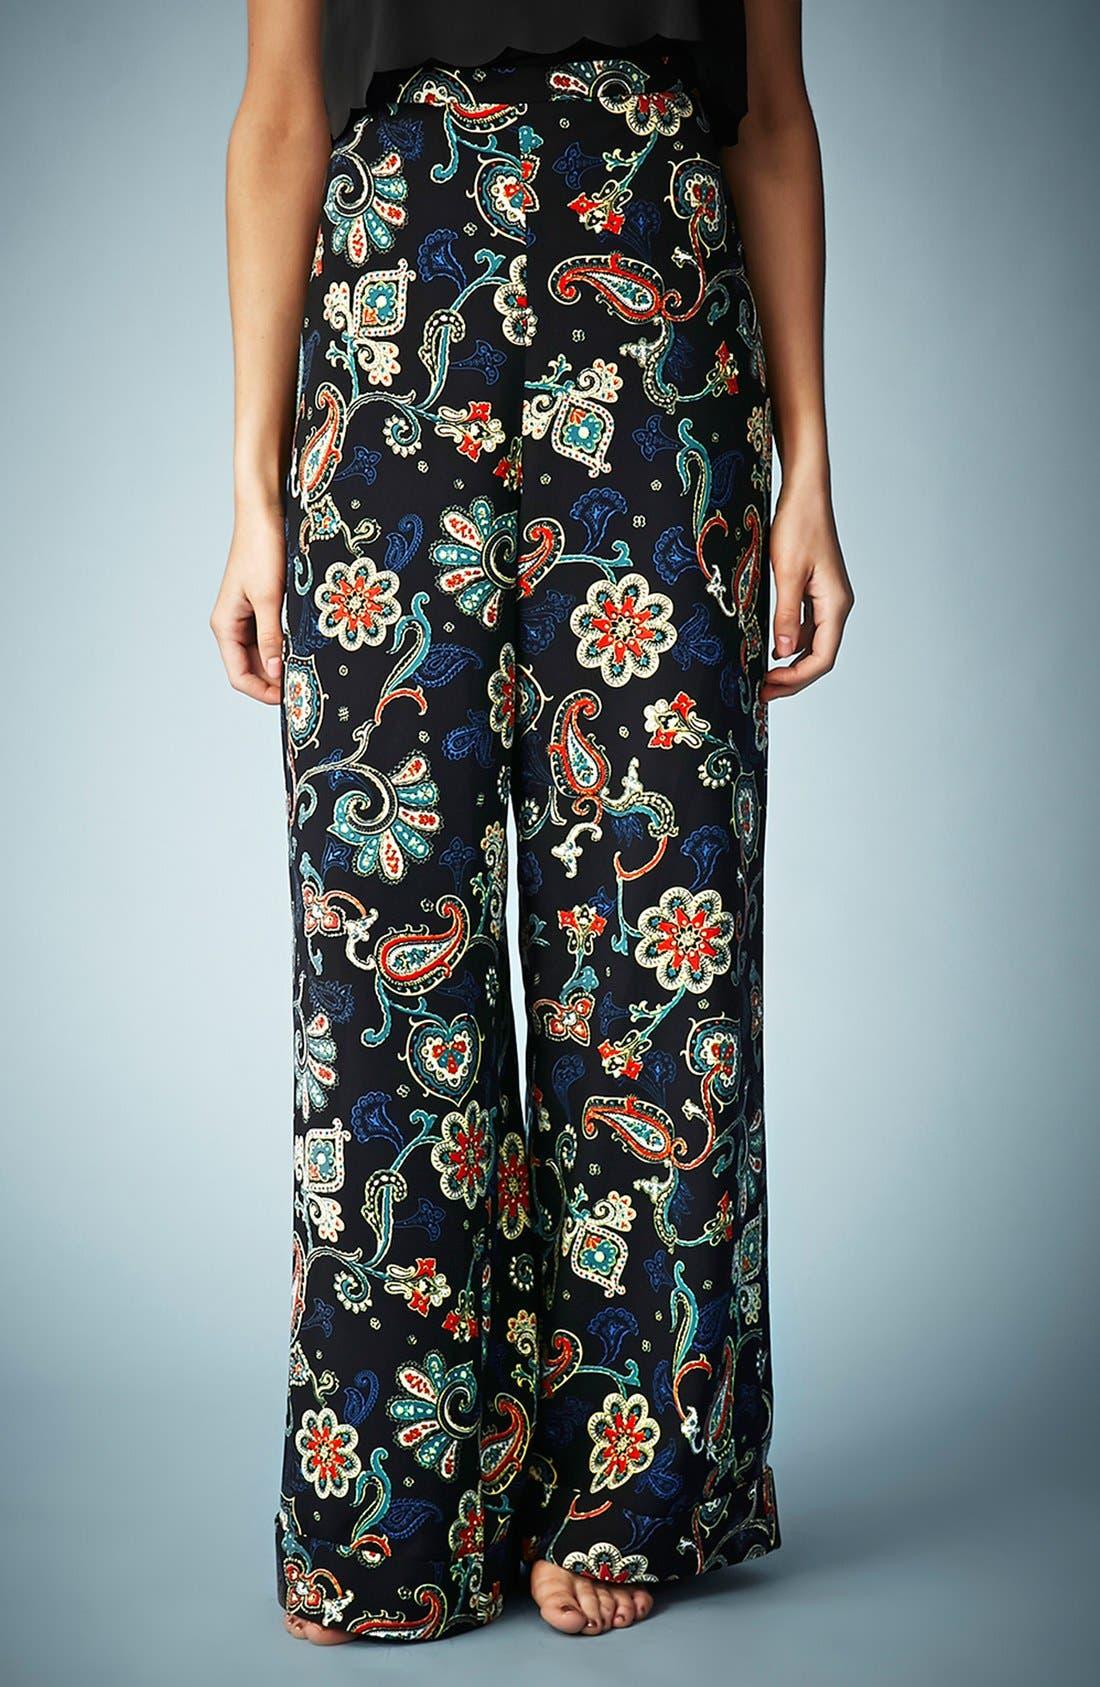 Main Image - Kate Moss for Topshop Paisley Wide Leg Pants